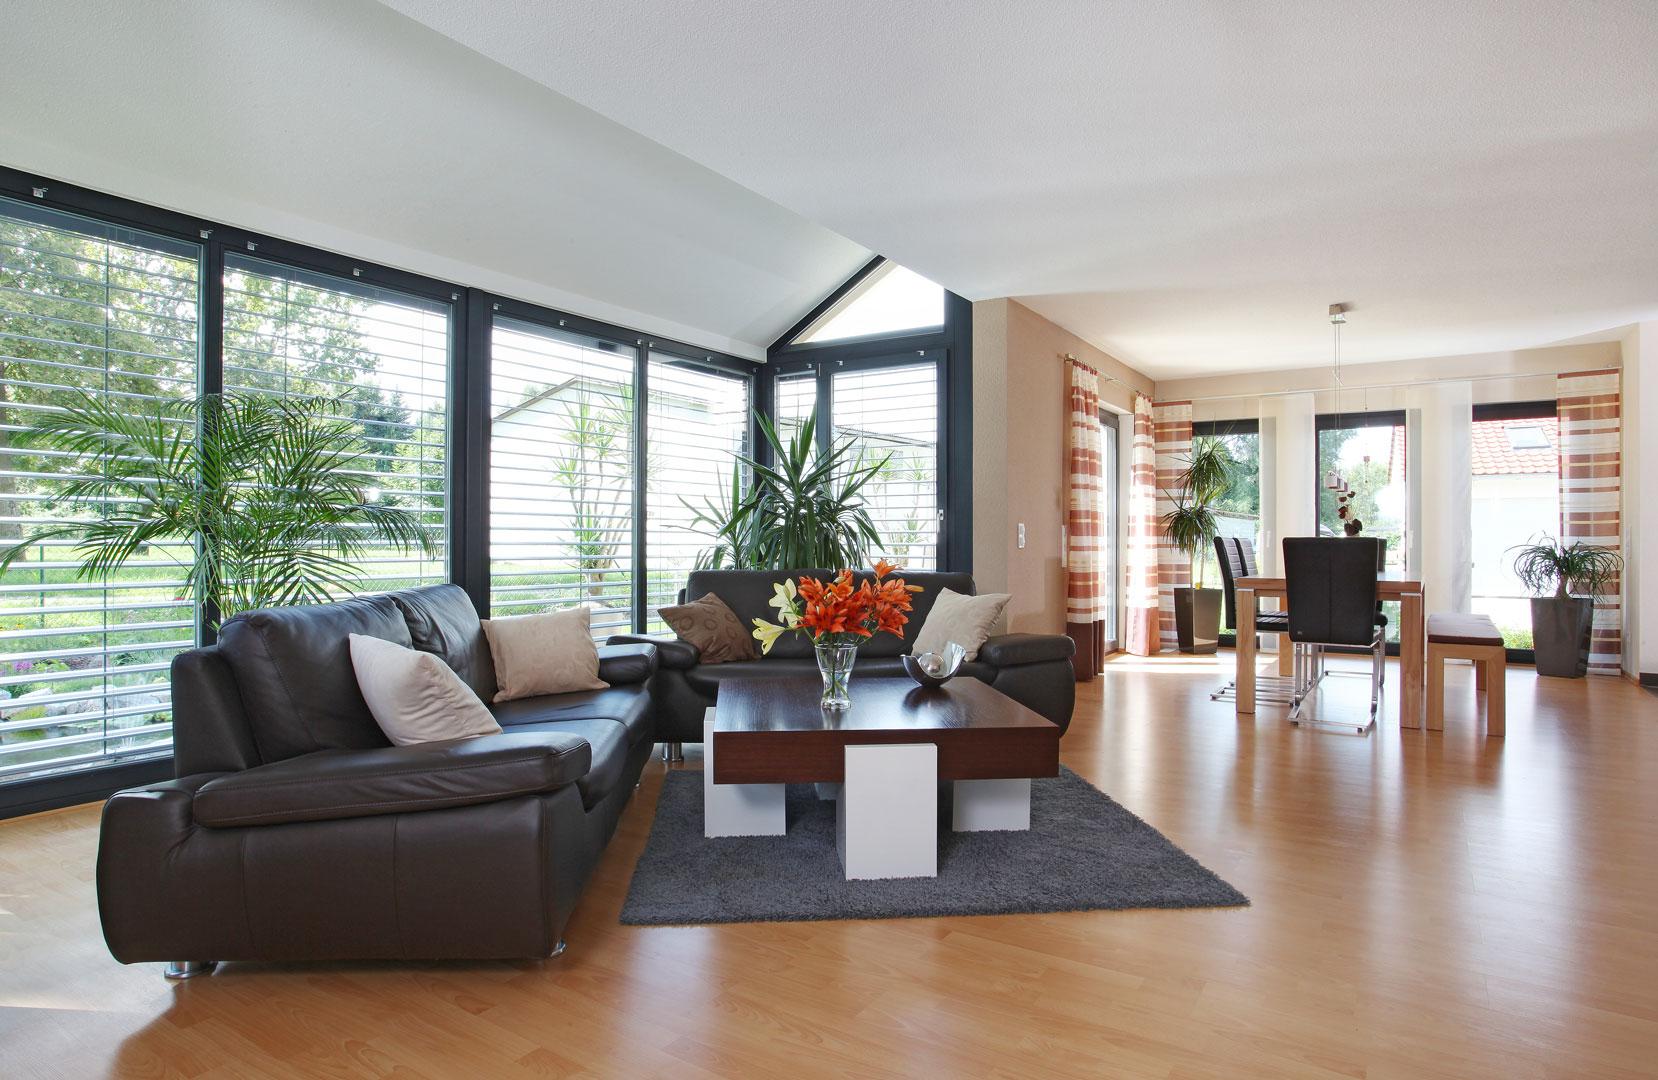 finowro woziesszi2 w. Black Bedroom Furniture Sets. Home Design Ideas